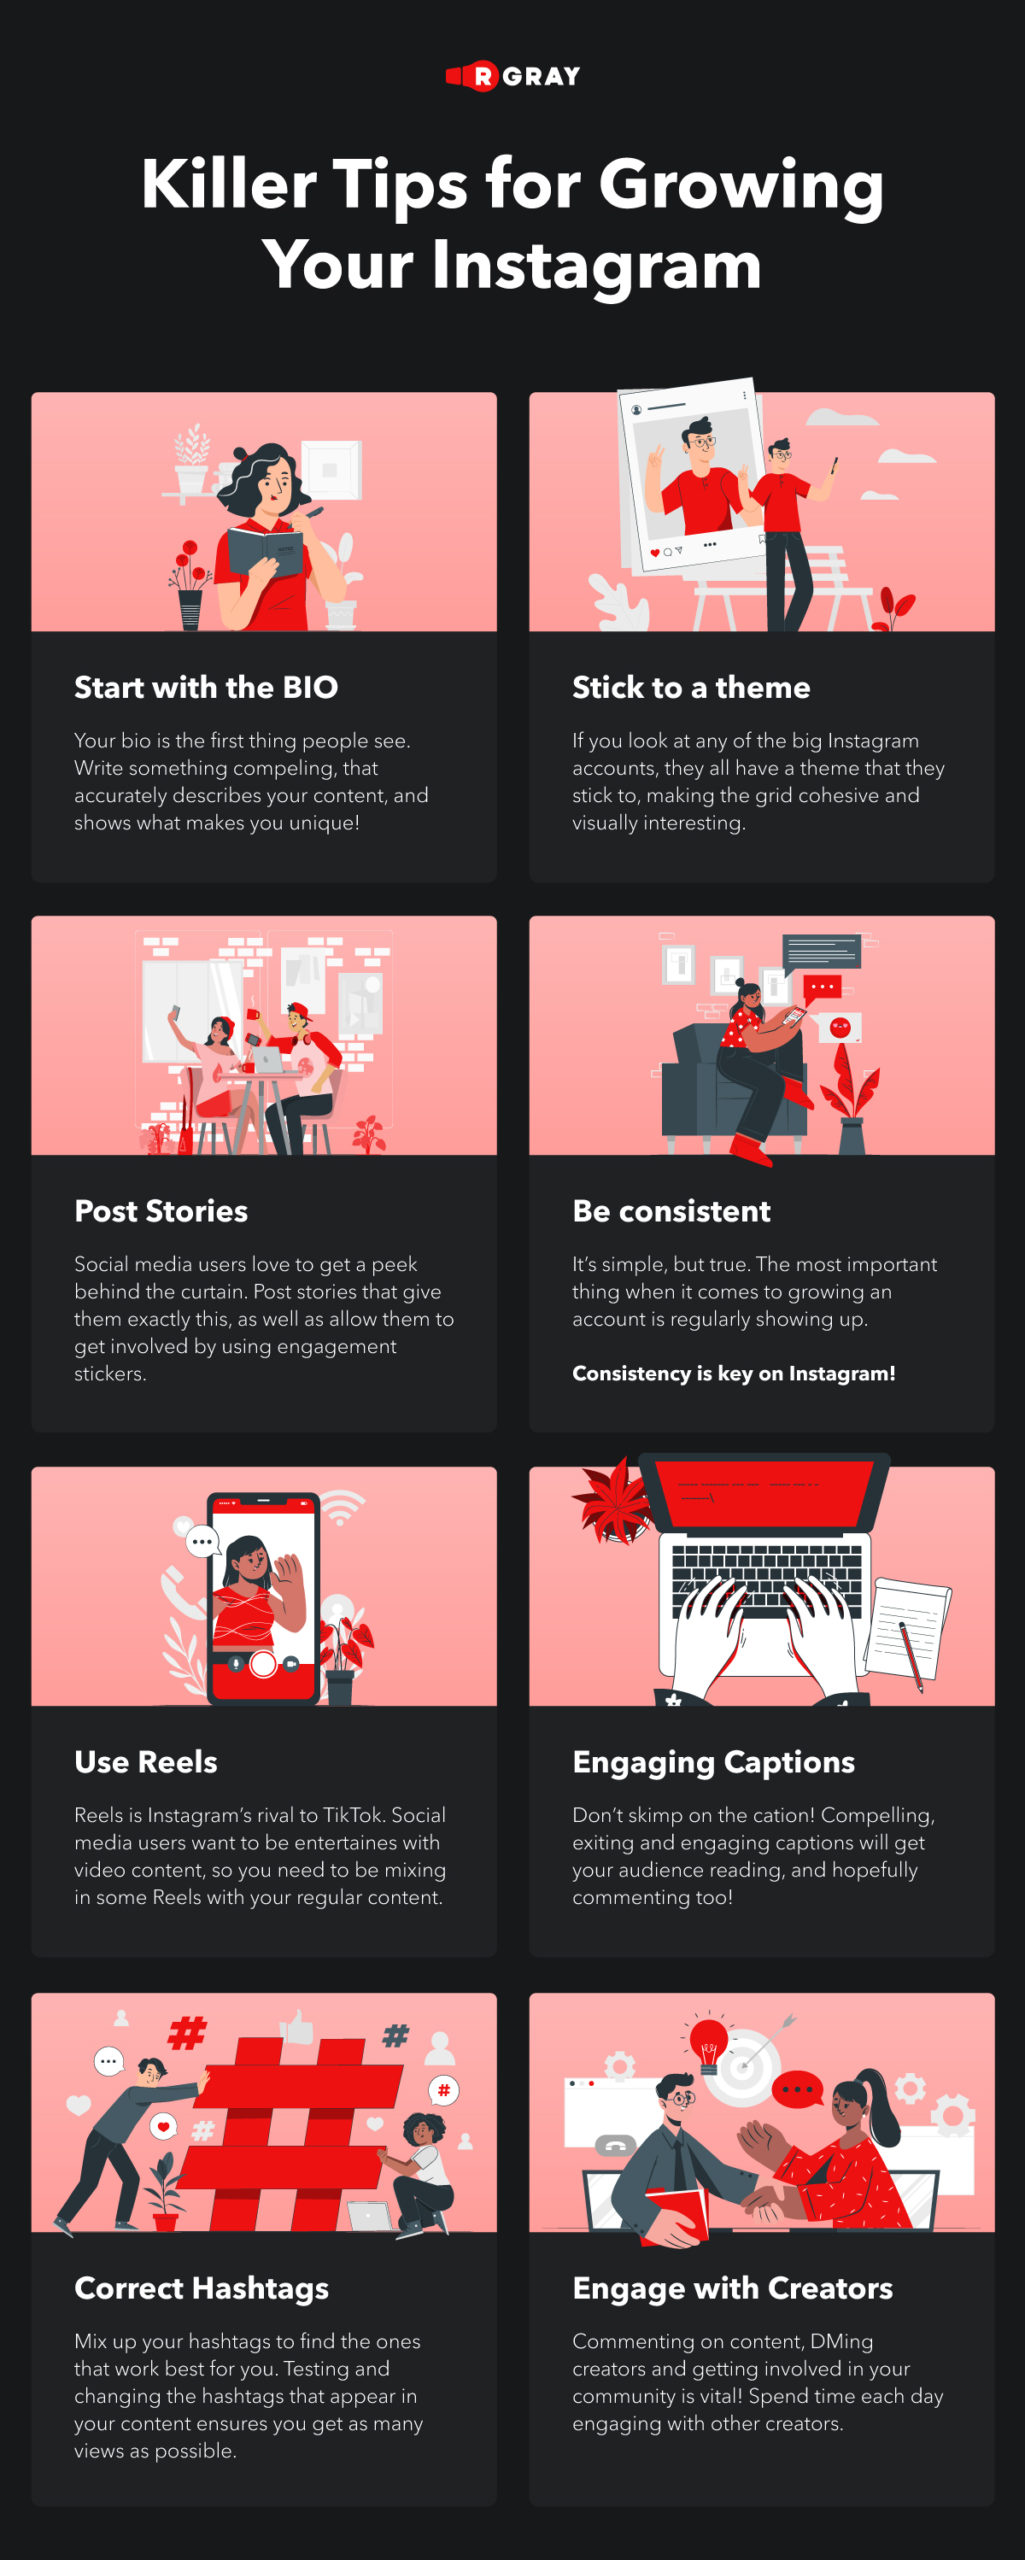 Key Tips for Maximizing Your Instagram Presence.